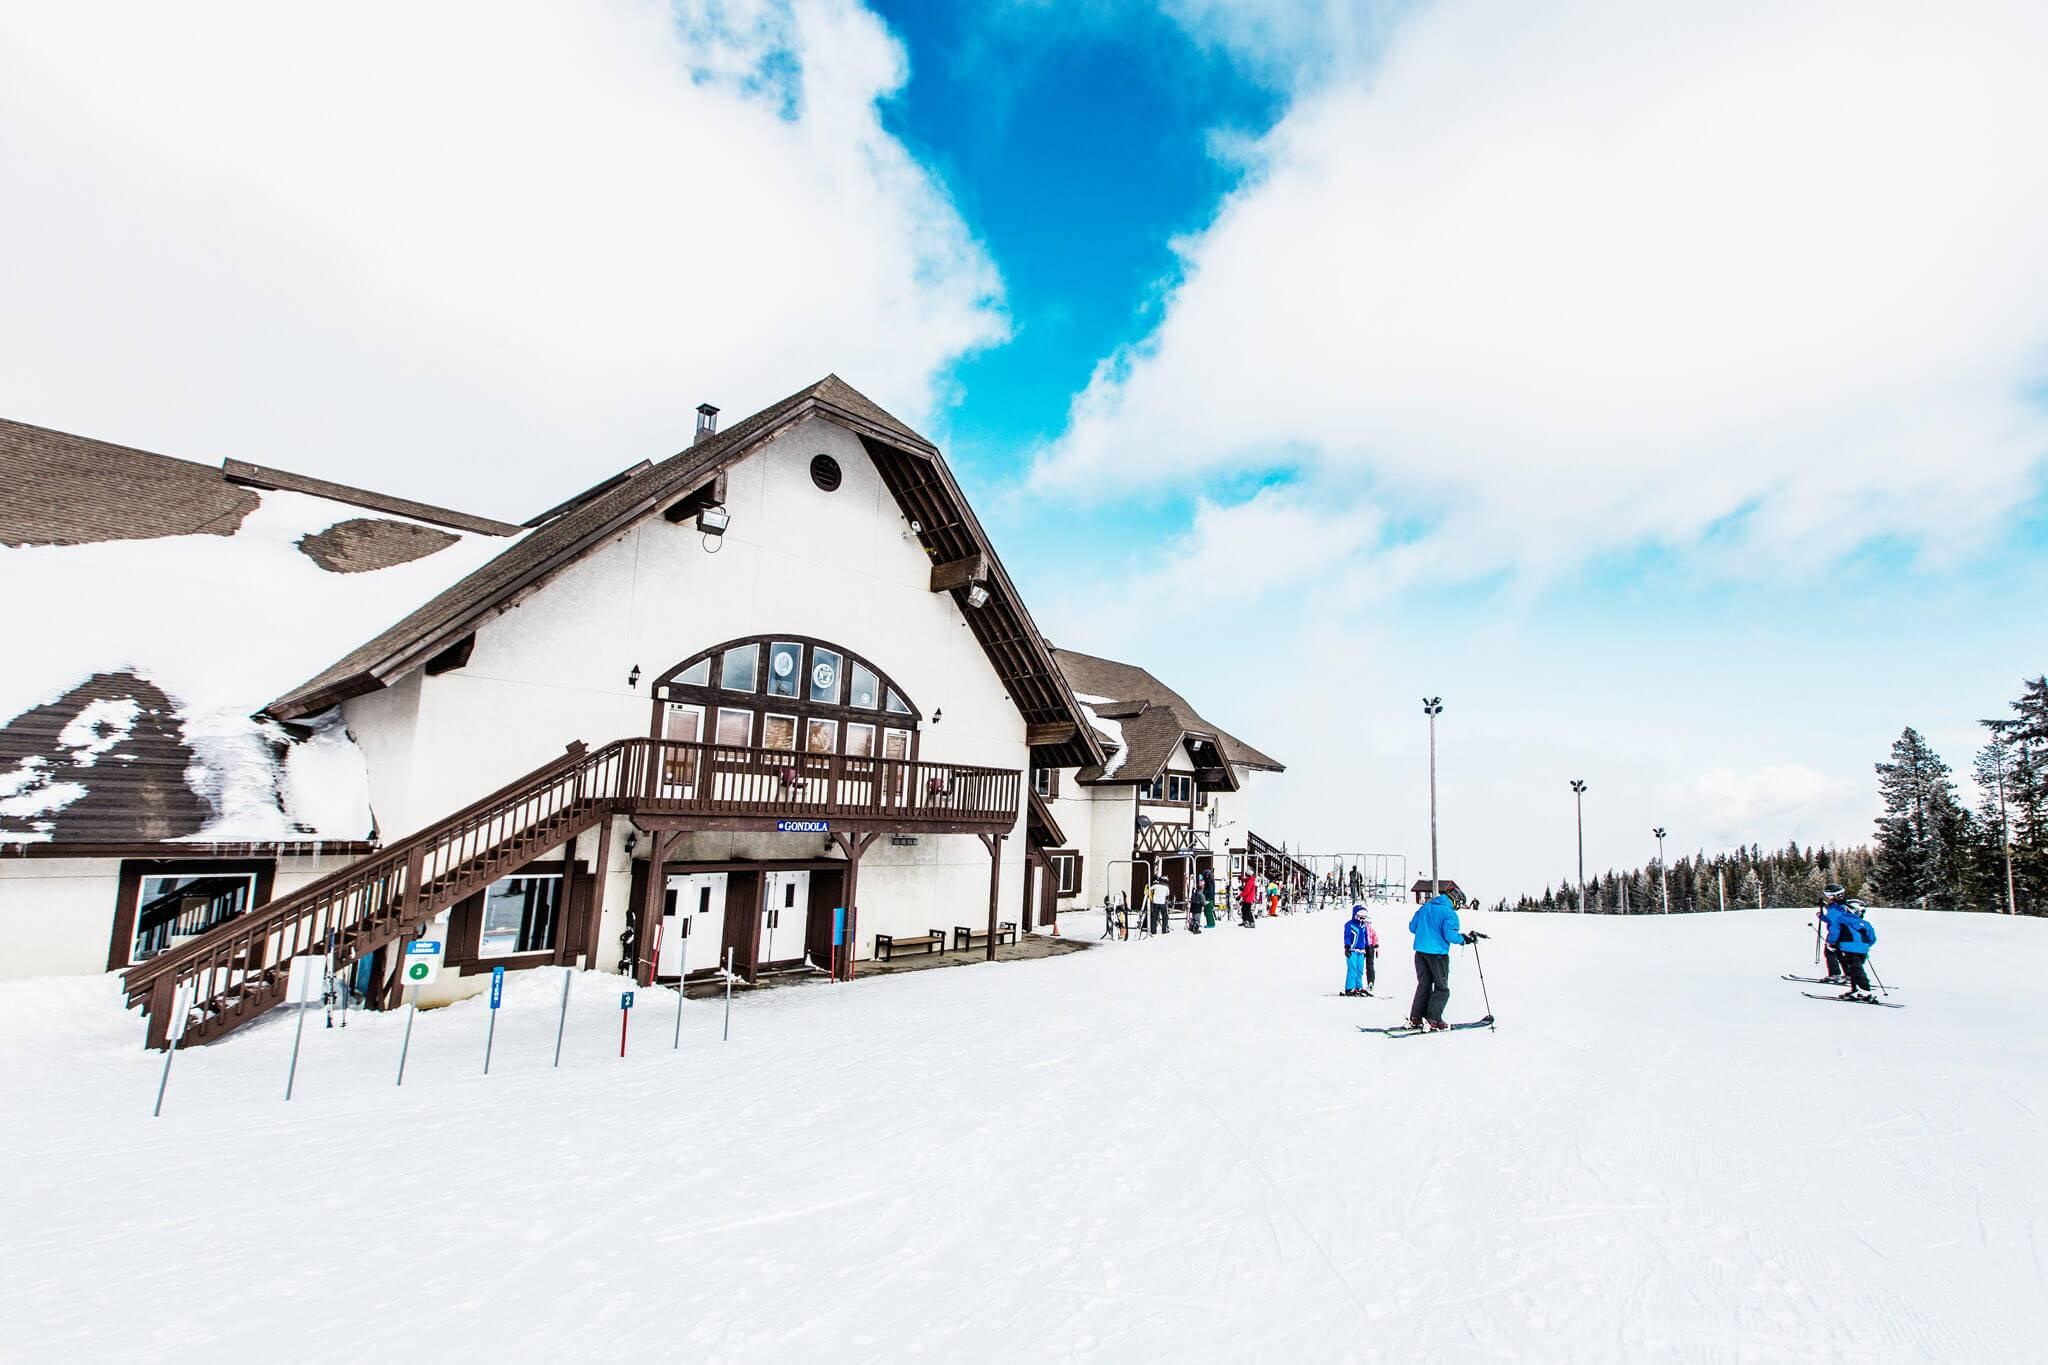 Silver Mountain Resort Lodge. Photo Credit: Idaho Tourism